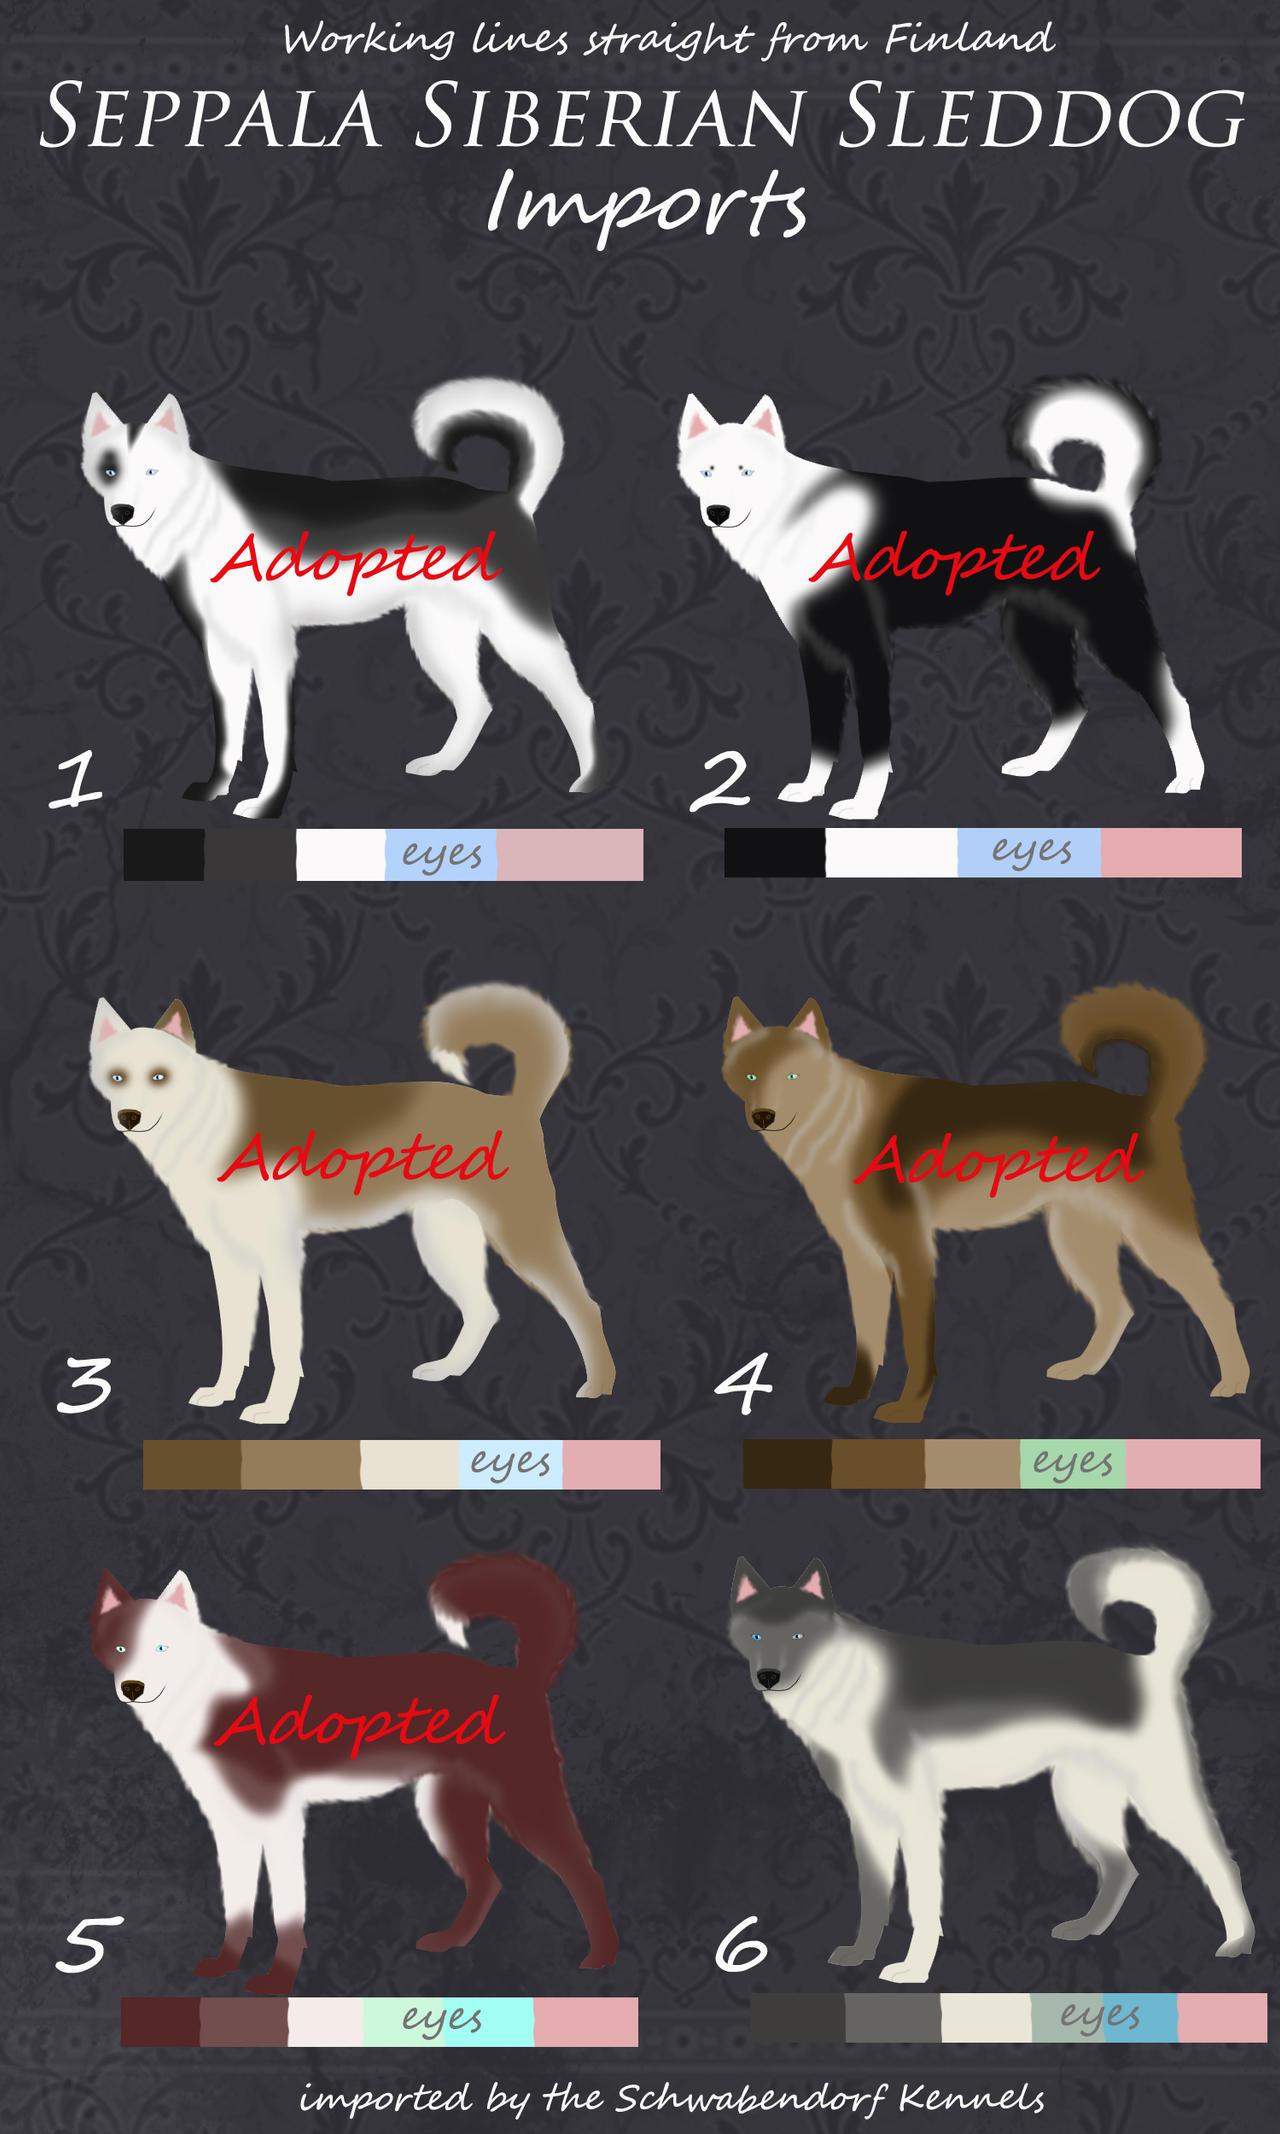 Seppala Siberian Sled Dog Kennels